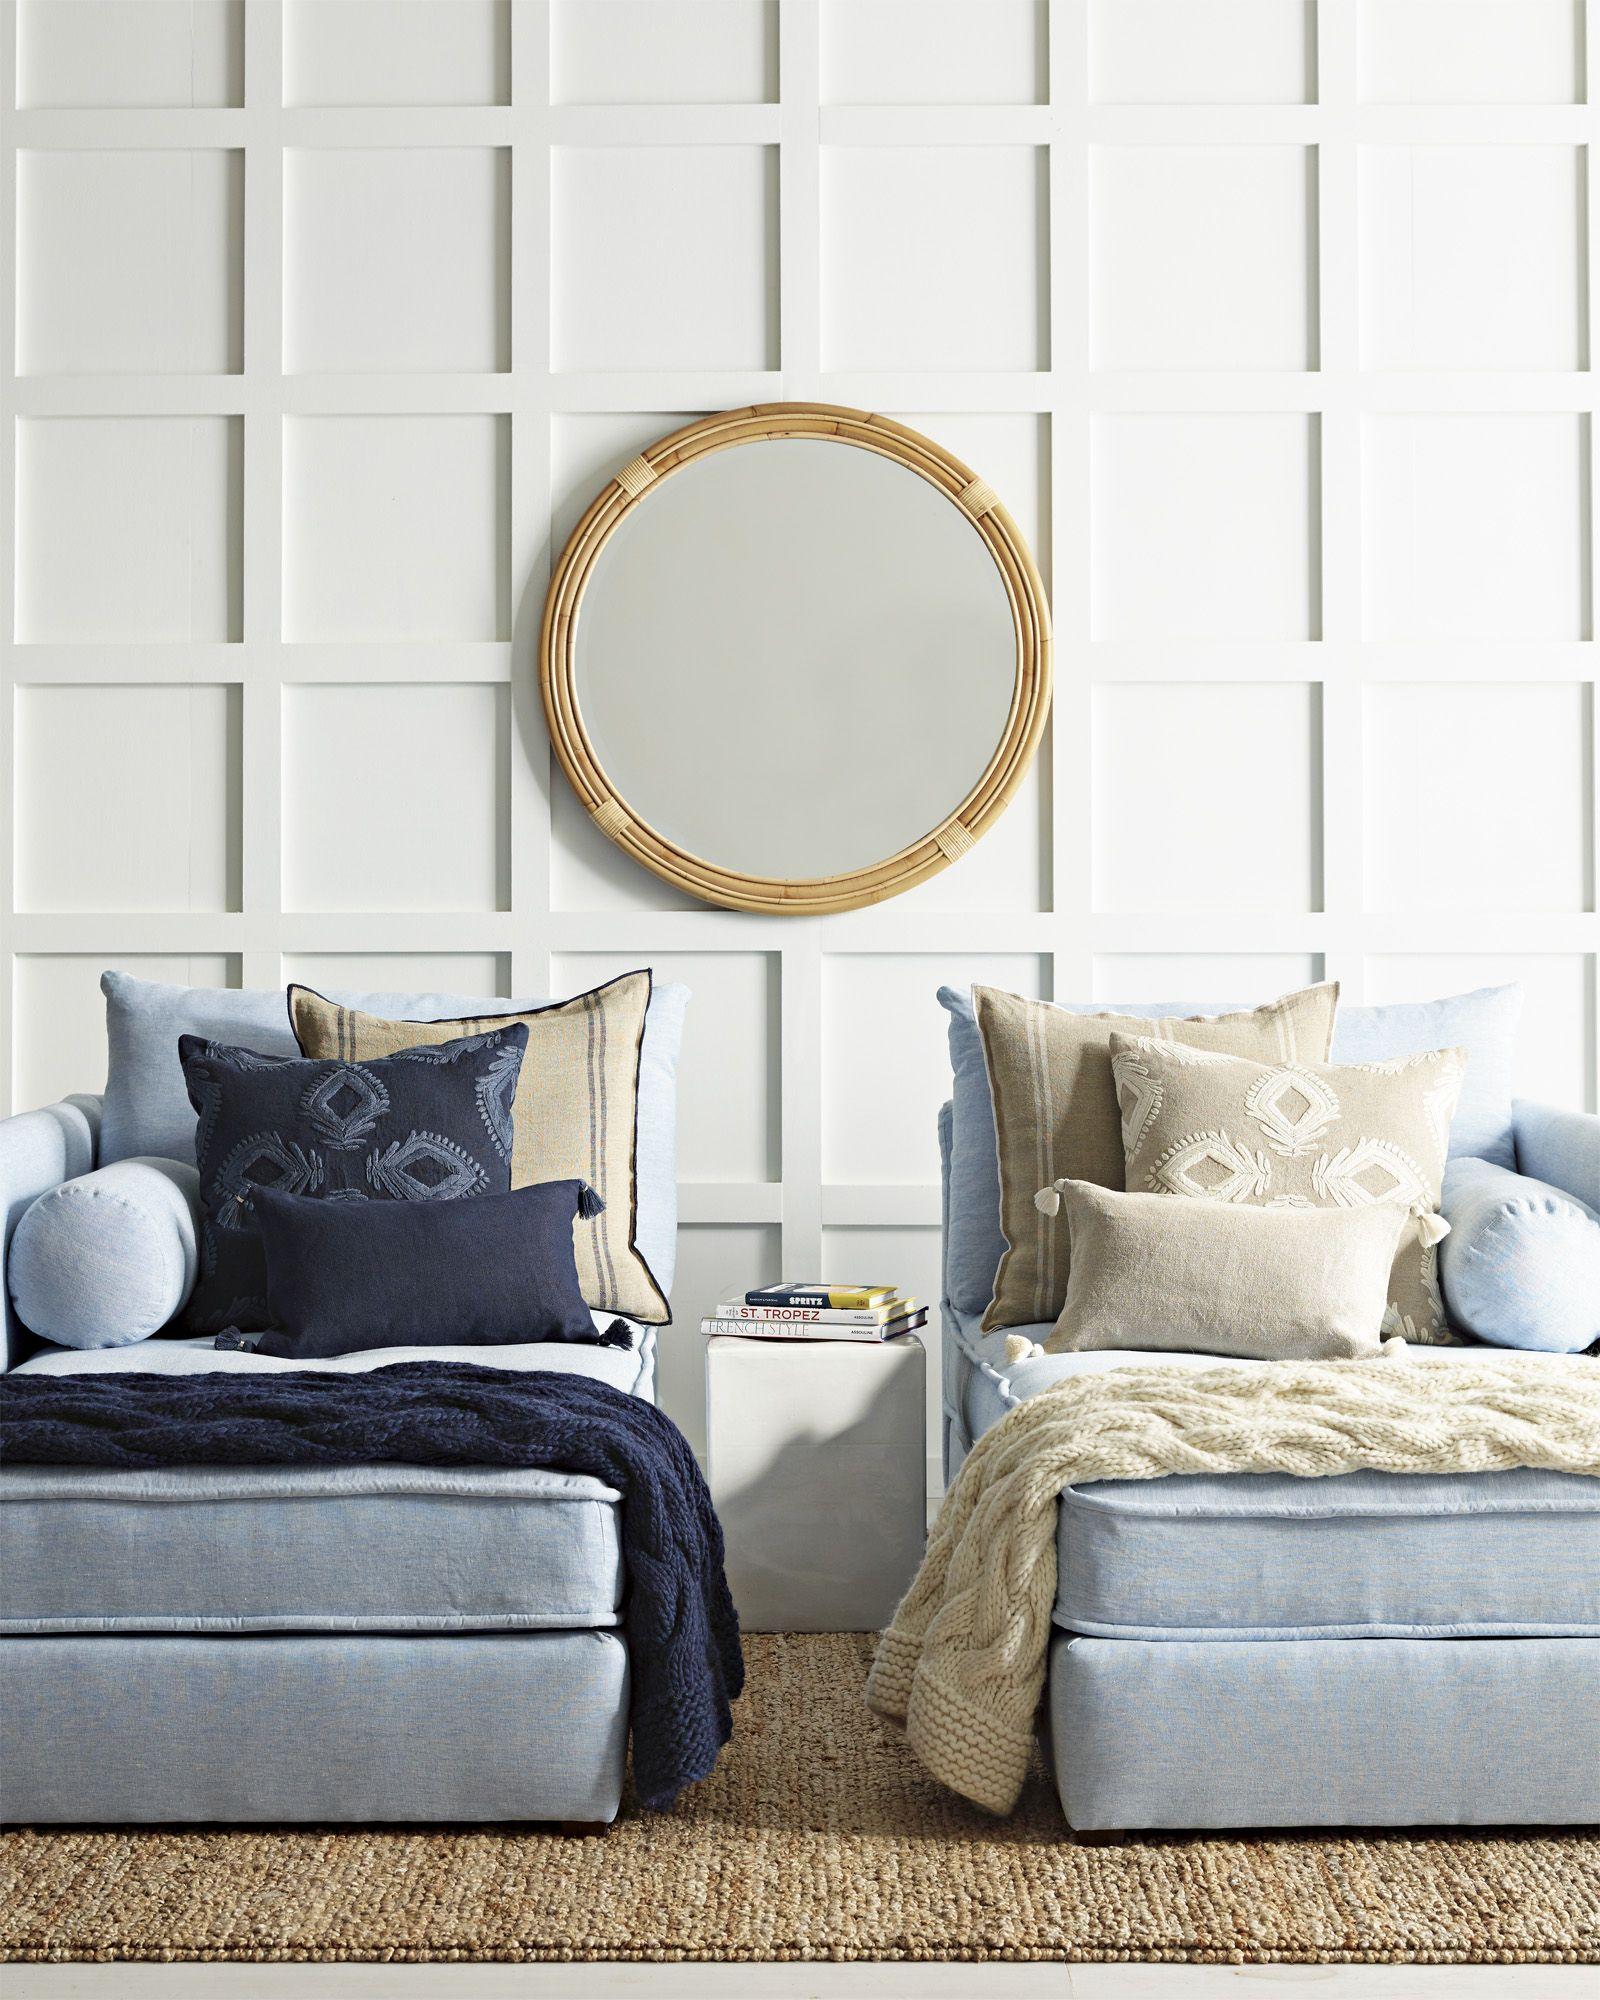 Bennett Chaise Right Benchsr G782 Coastal Living Rooms Home Decor Coastal Bedrooms